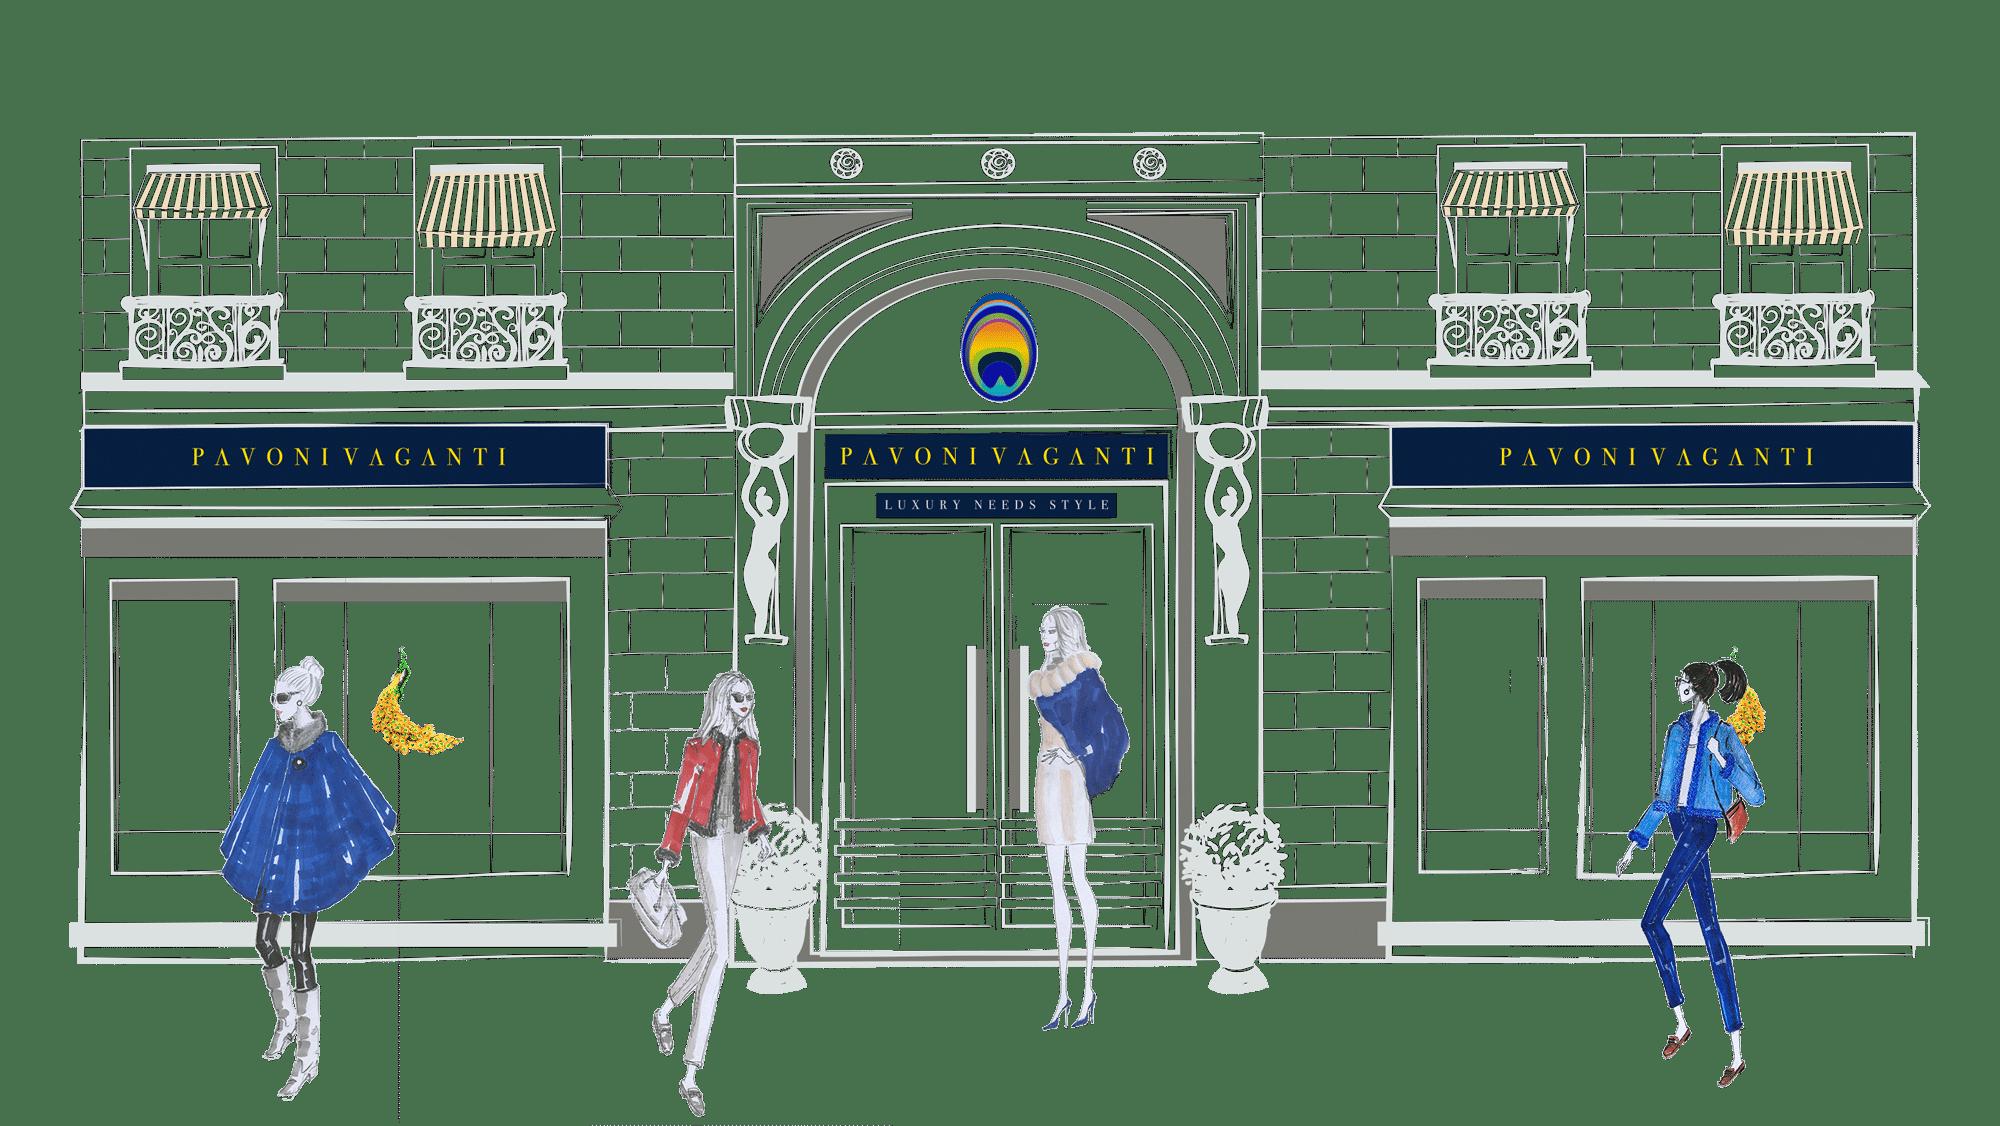 collection front store pavoni vaganti 6